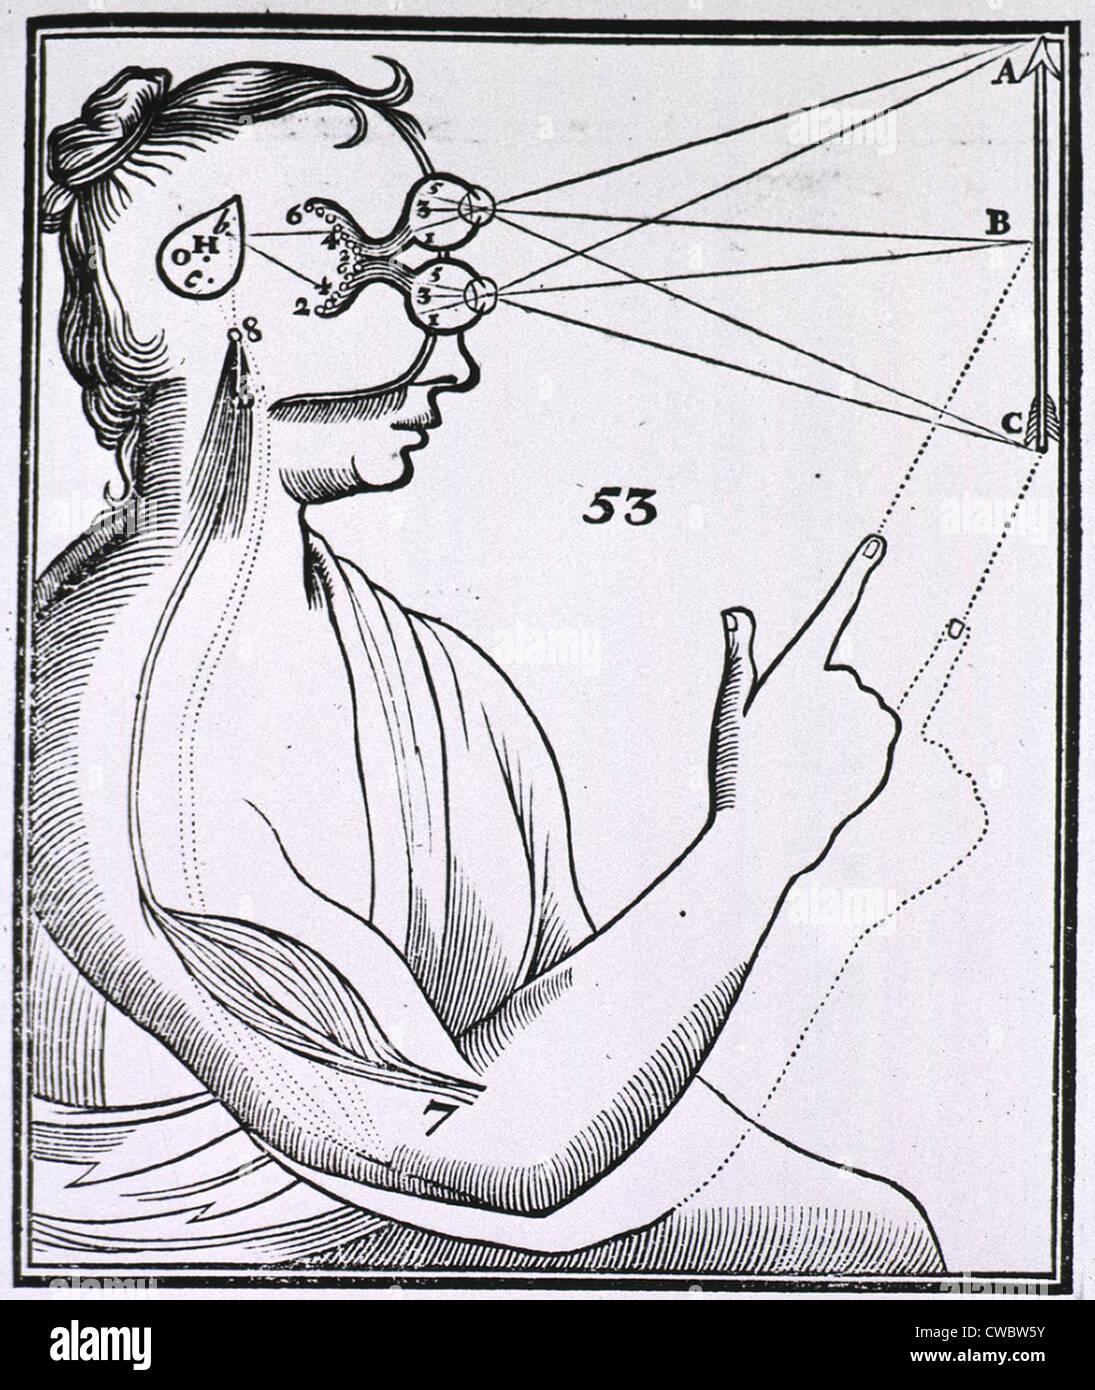 Descartess Theory of Action